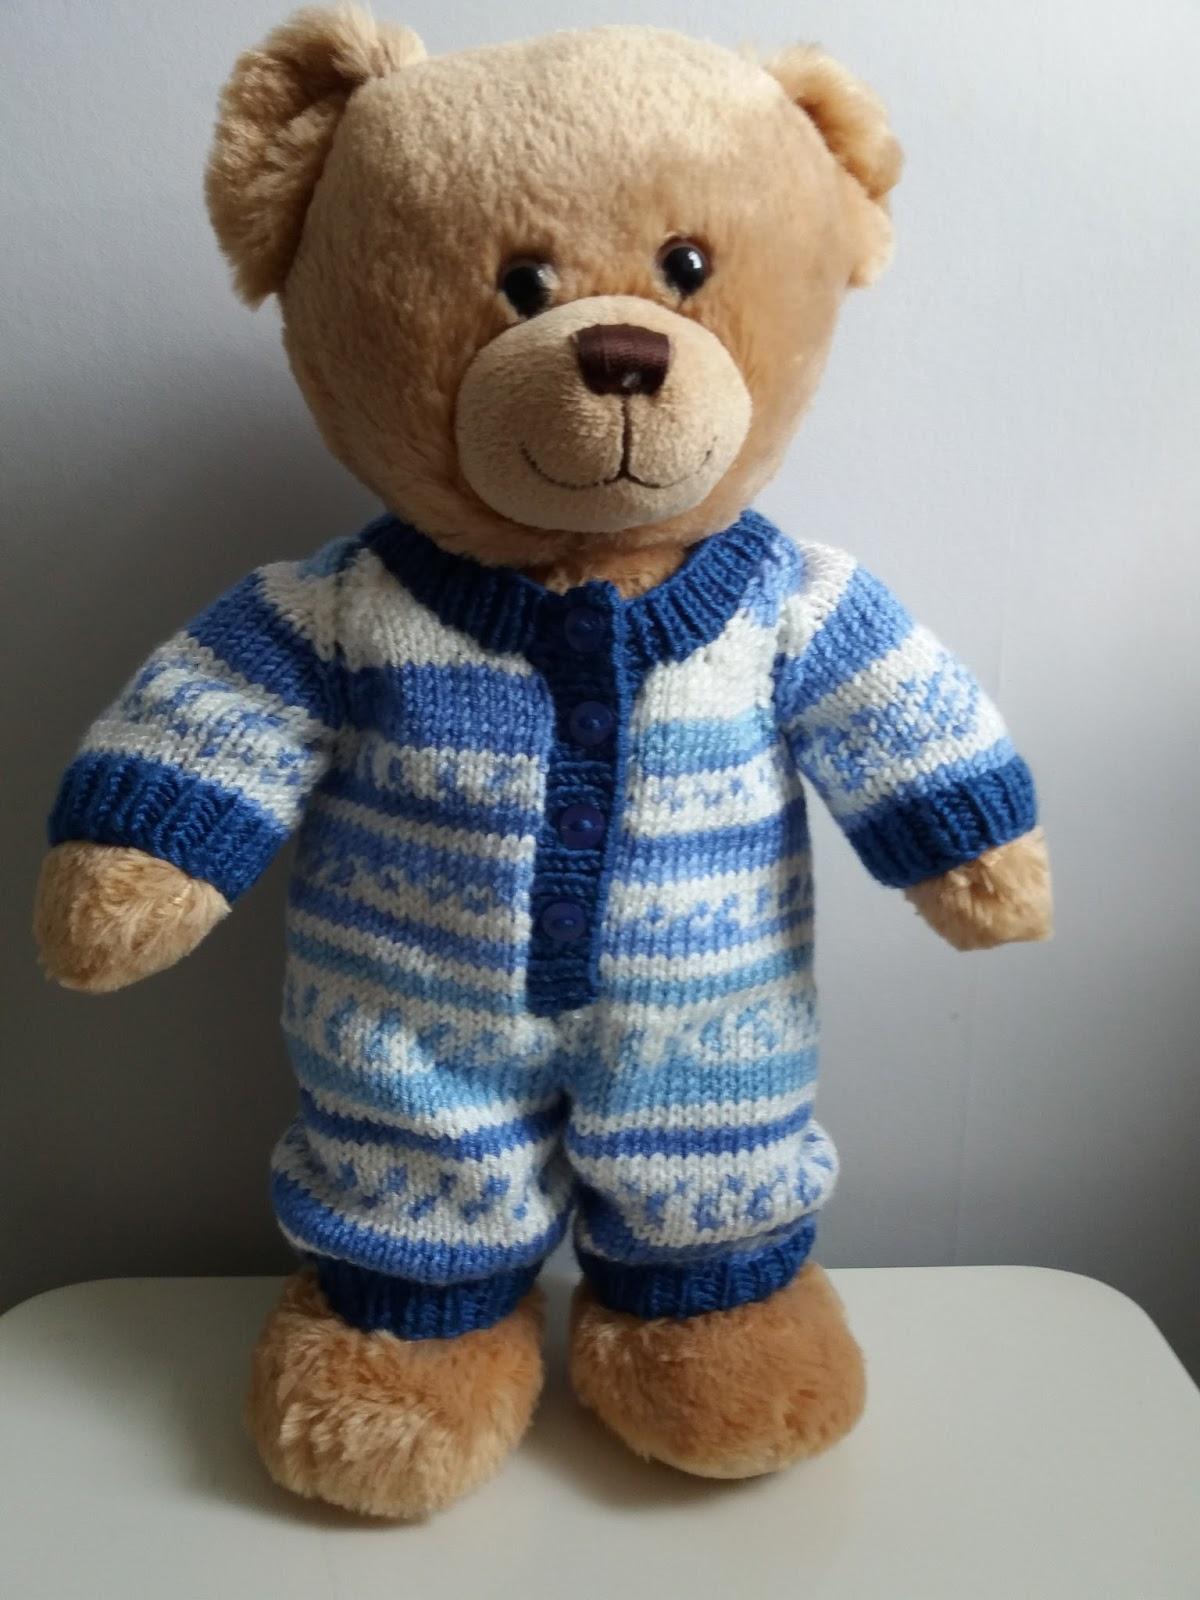 Linmary Knits: Teddy bear onesie